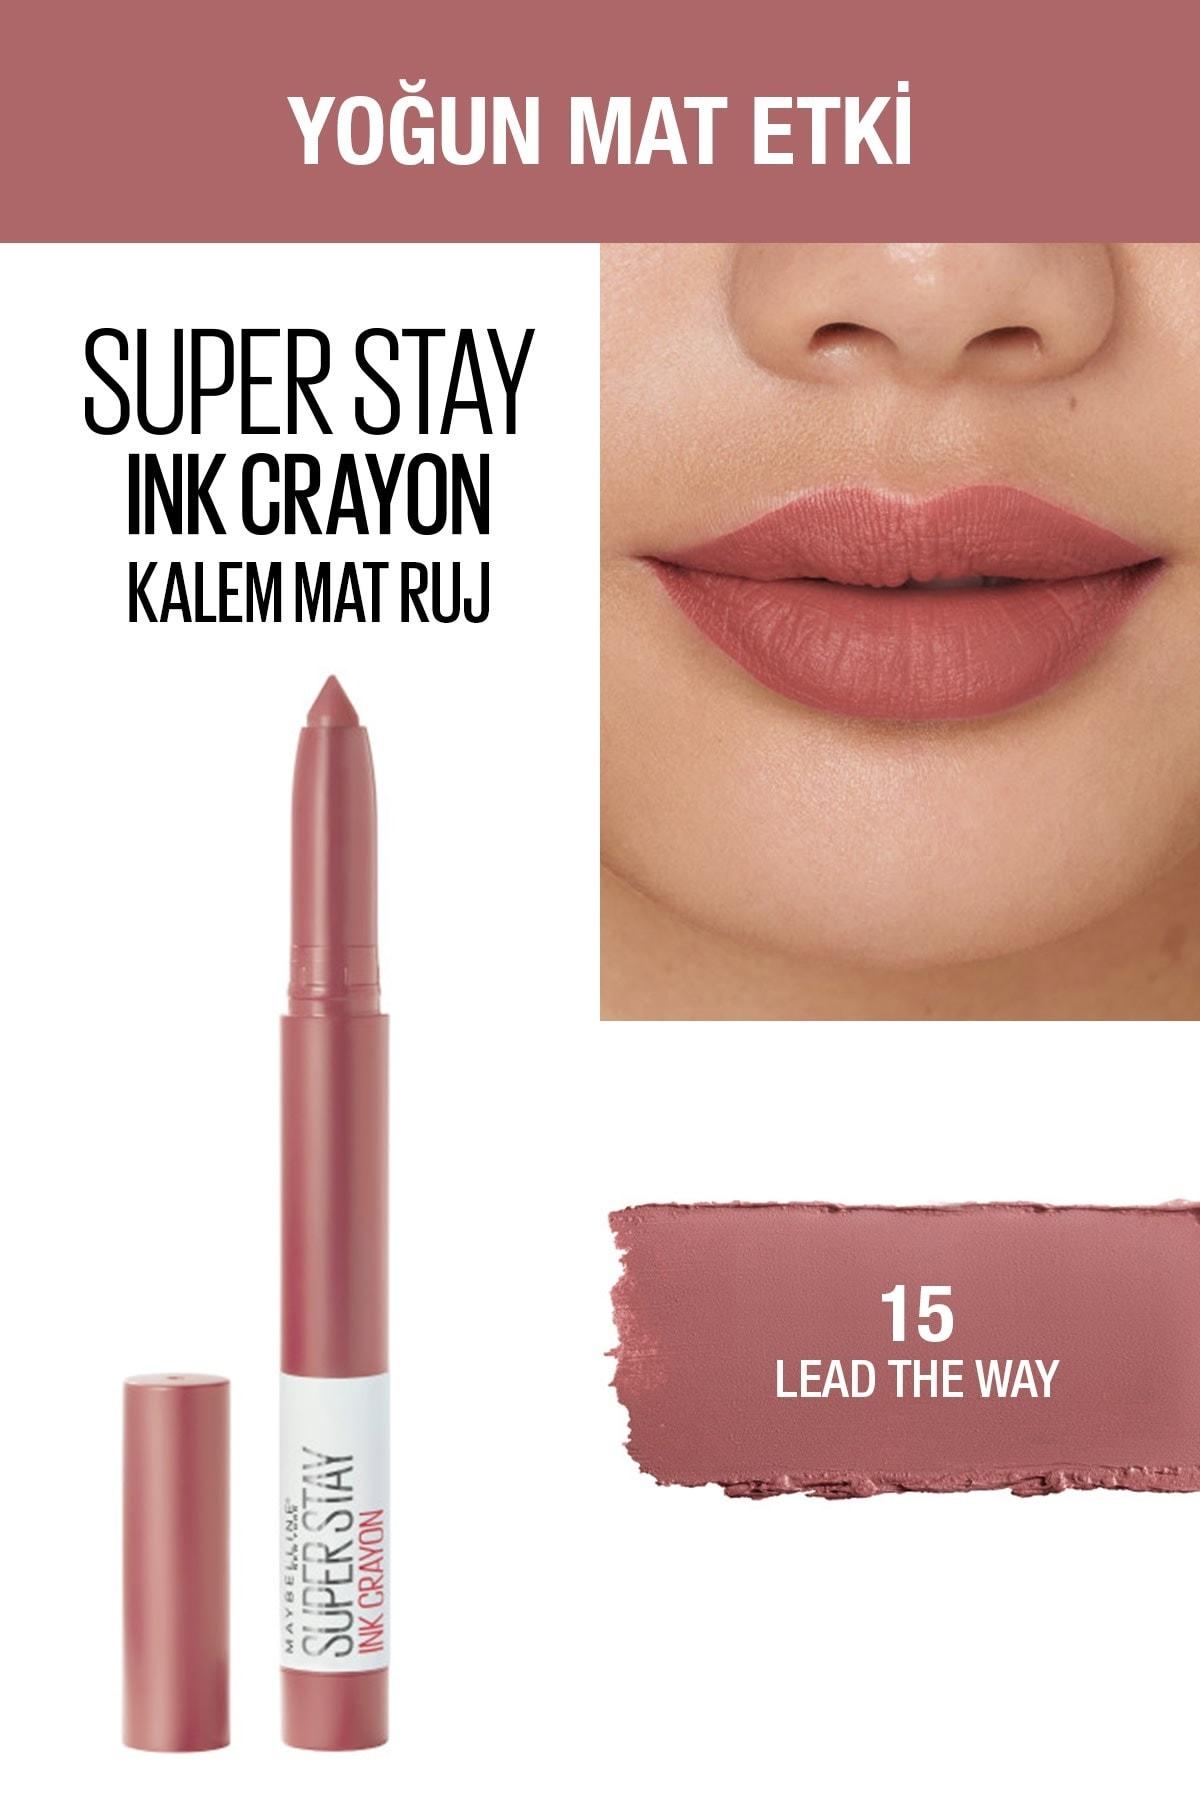 Maybelline New York Kalem Ruj - Sw Superstay Ink Crayon 15 Lead the Way 30174184